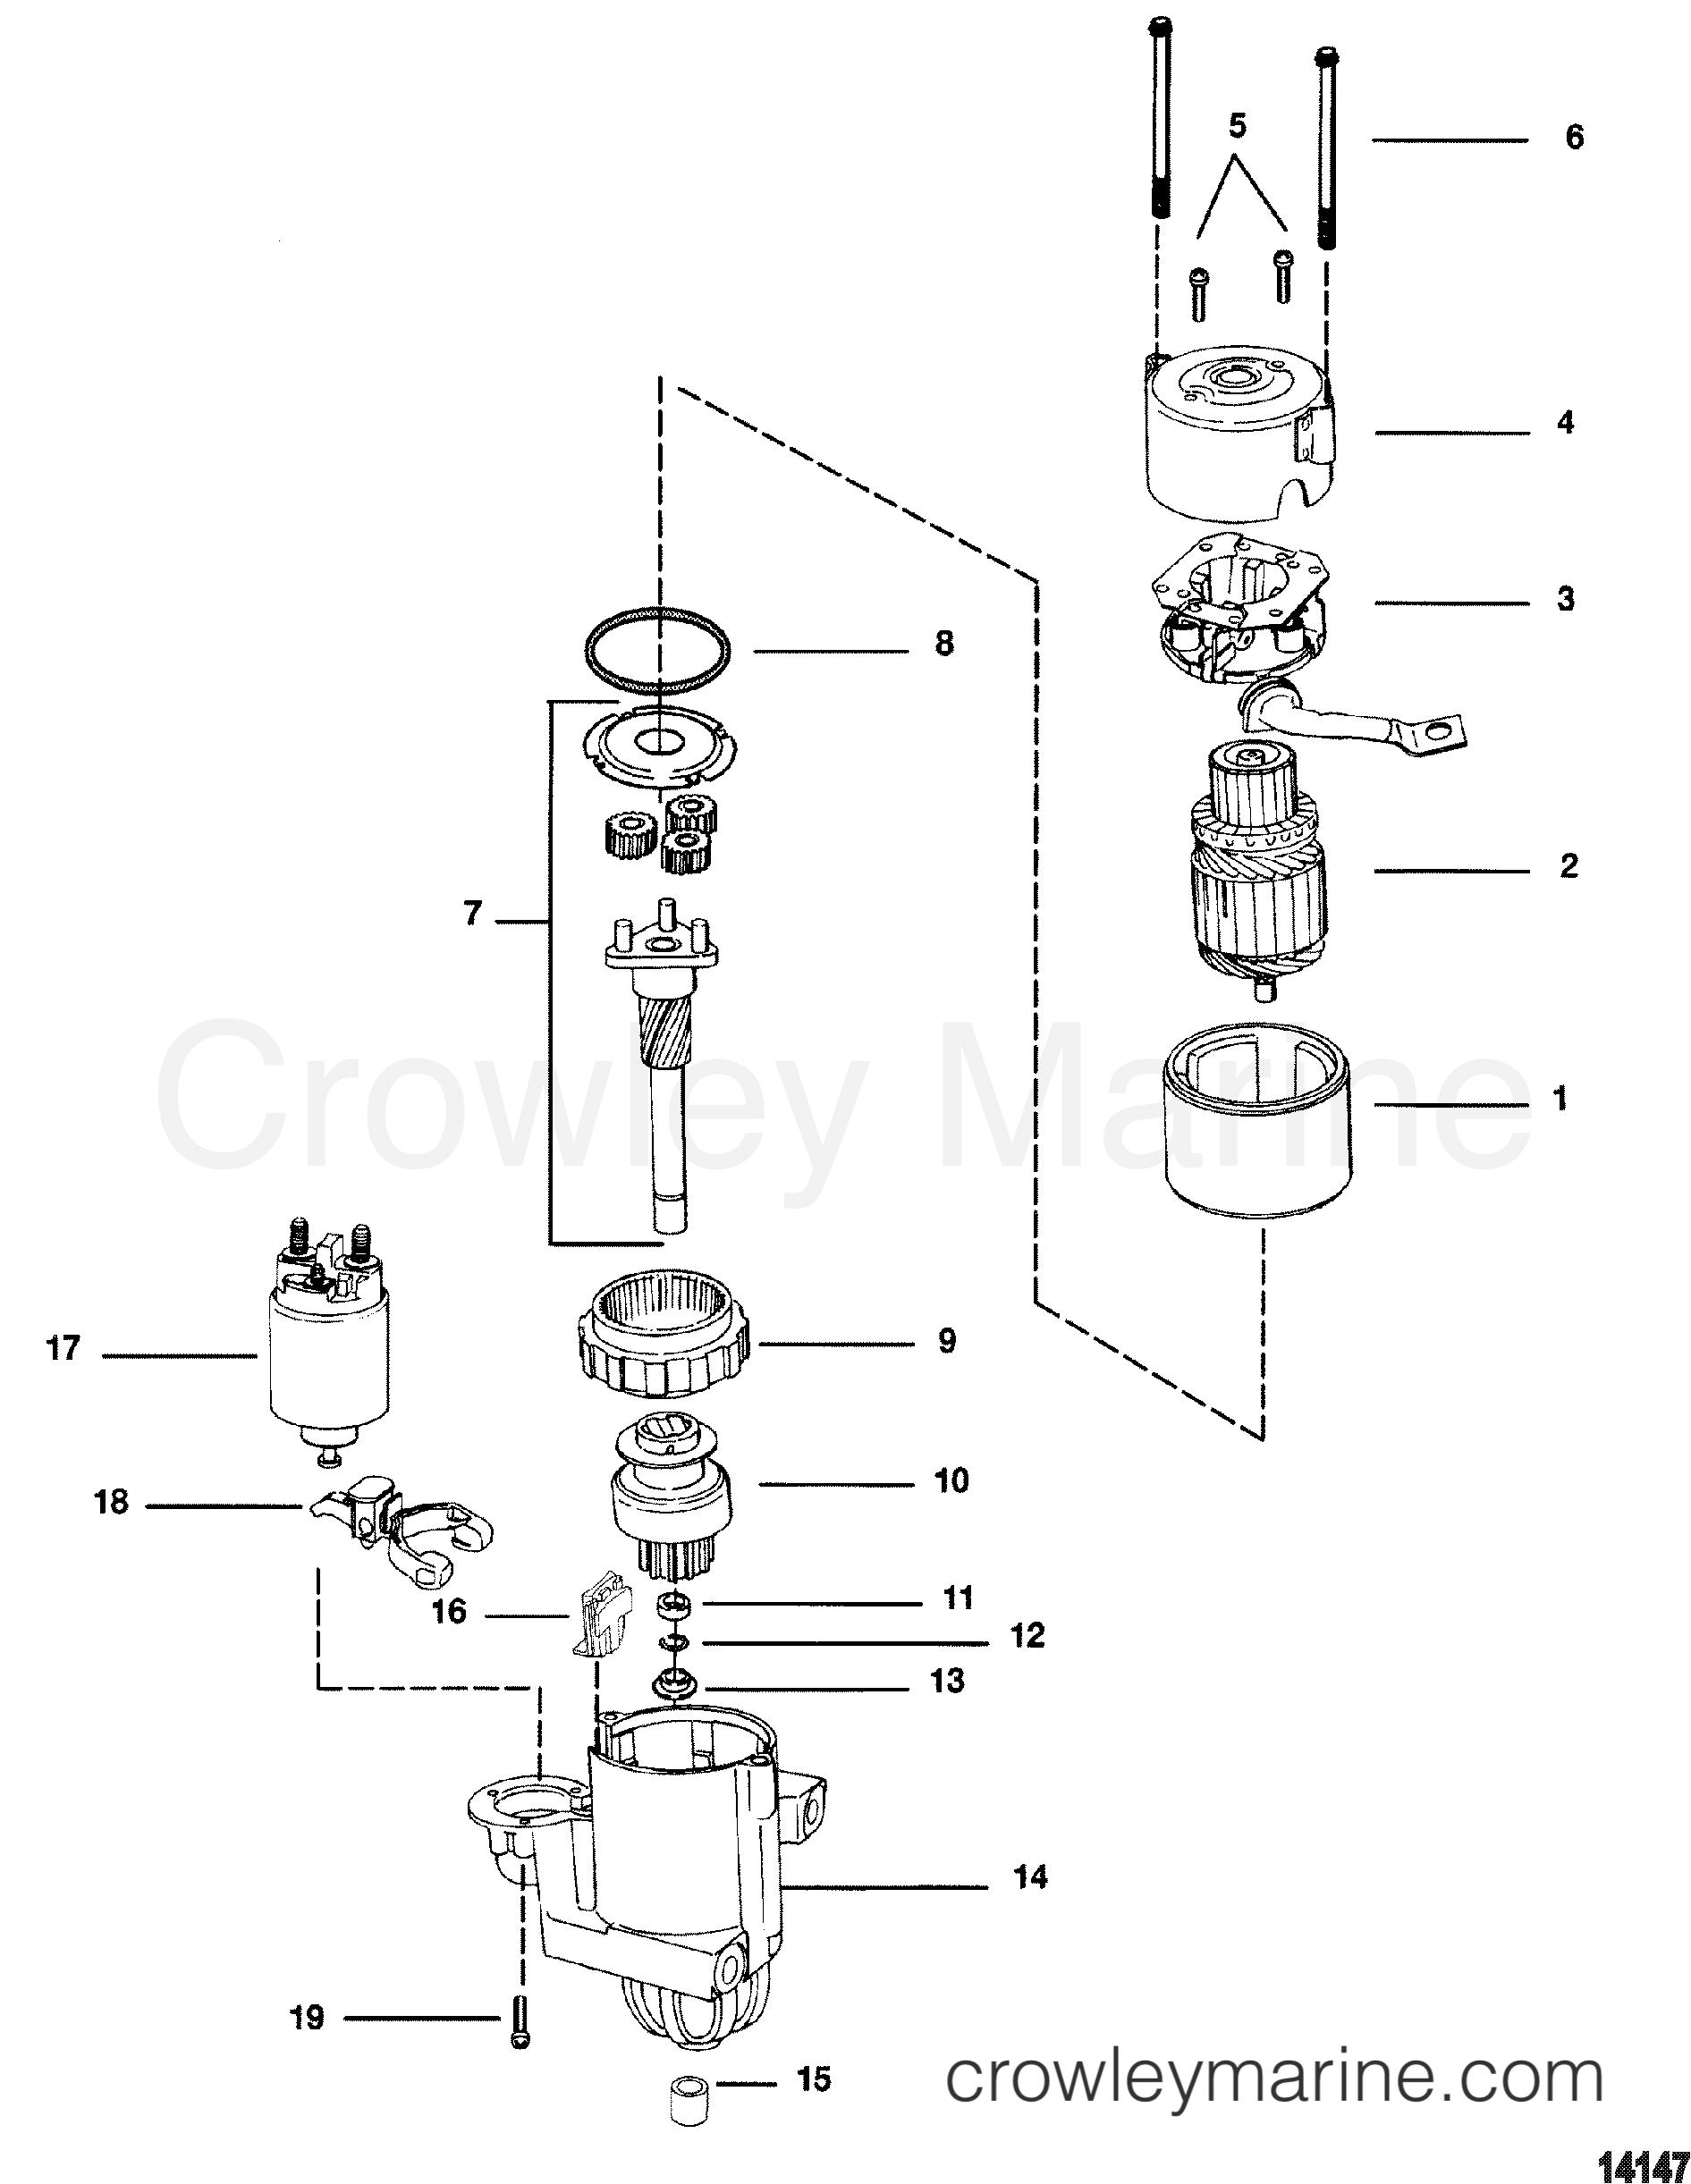 1928 chevrolet wiring diagram  chevrolet  auto fuse box